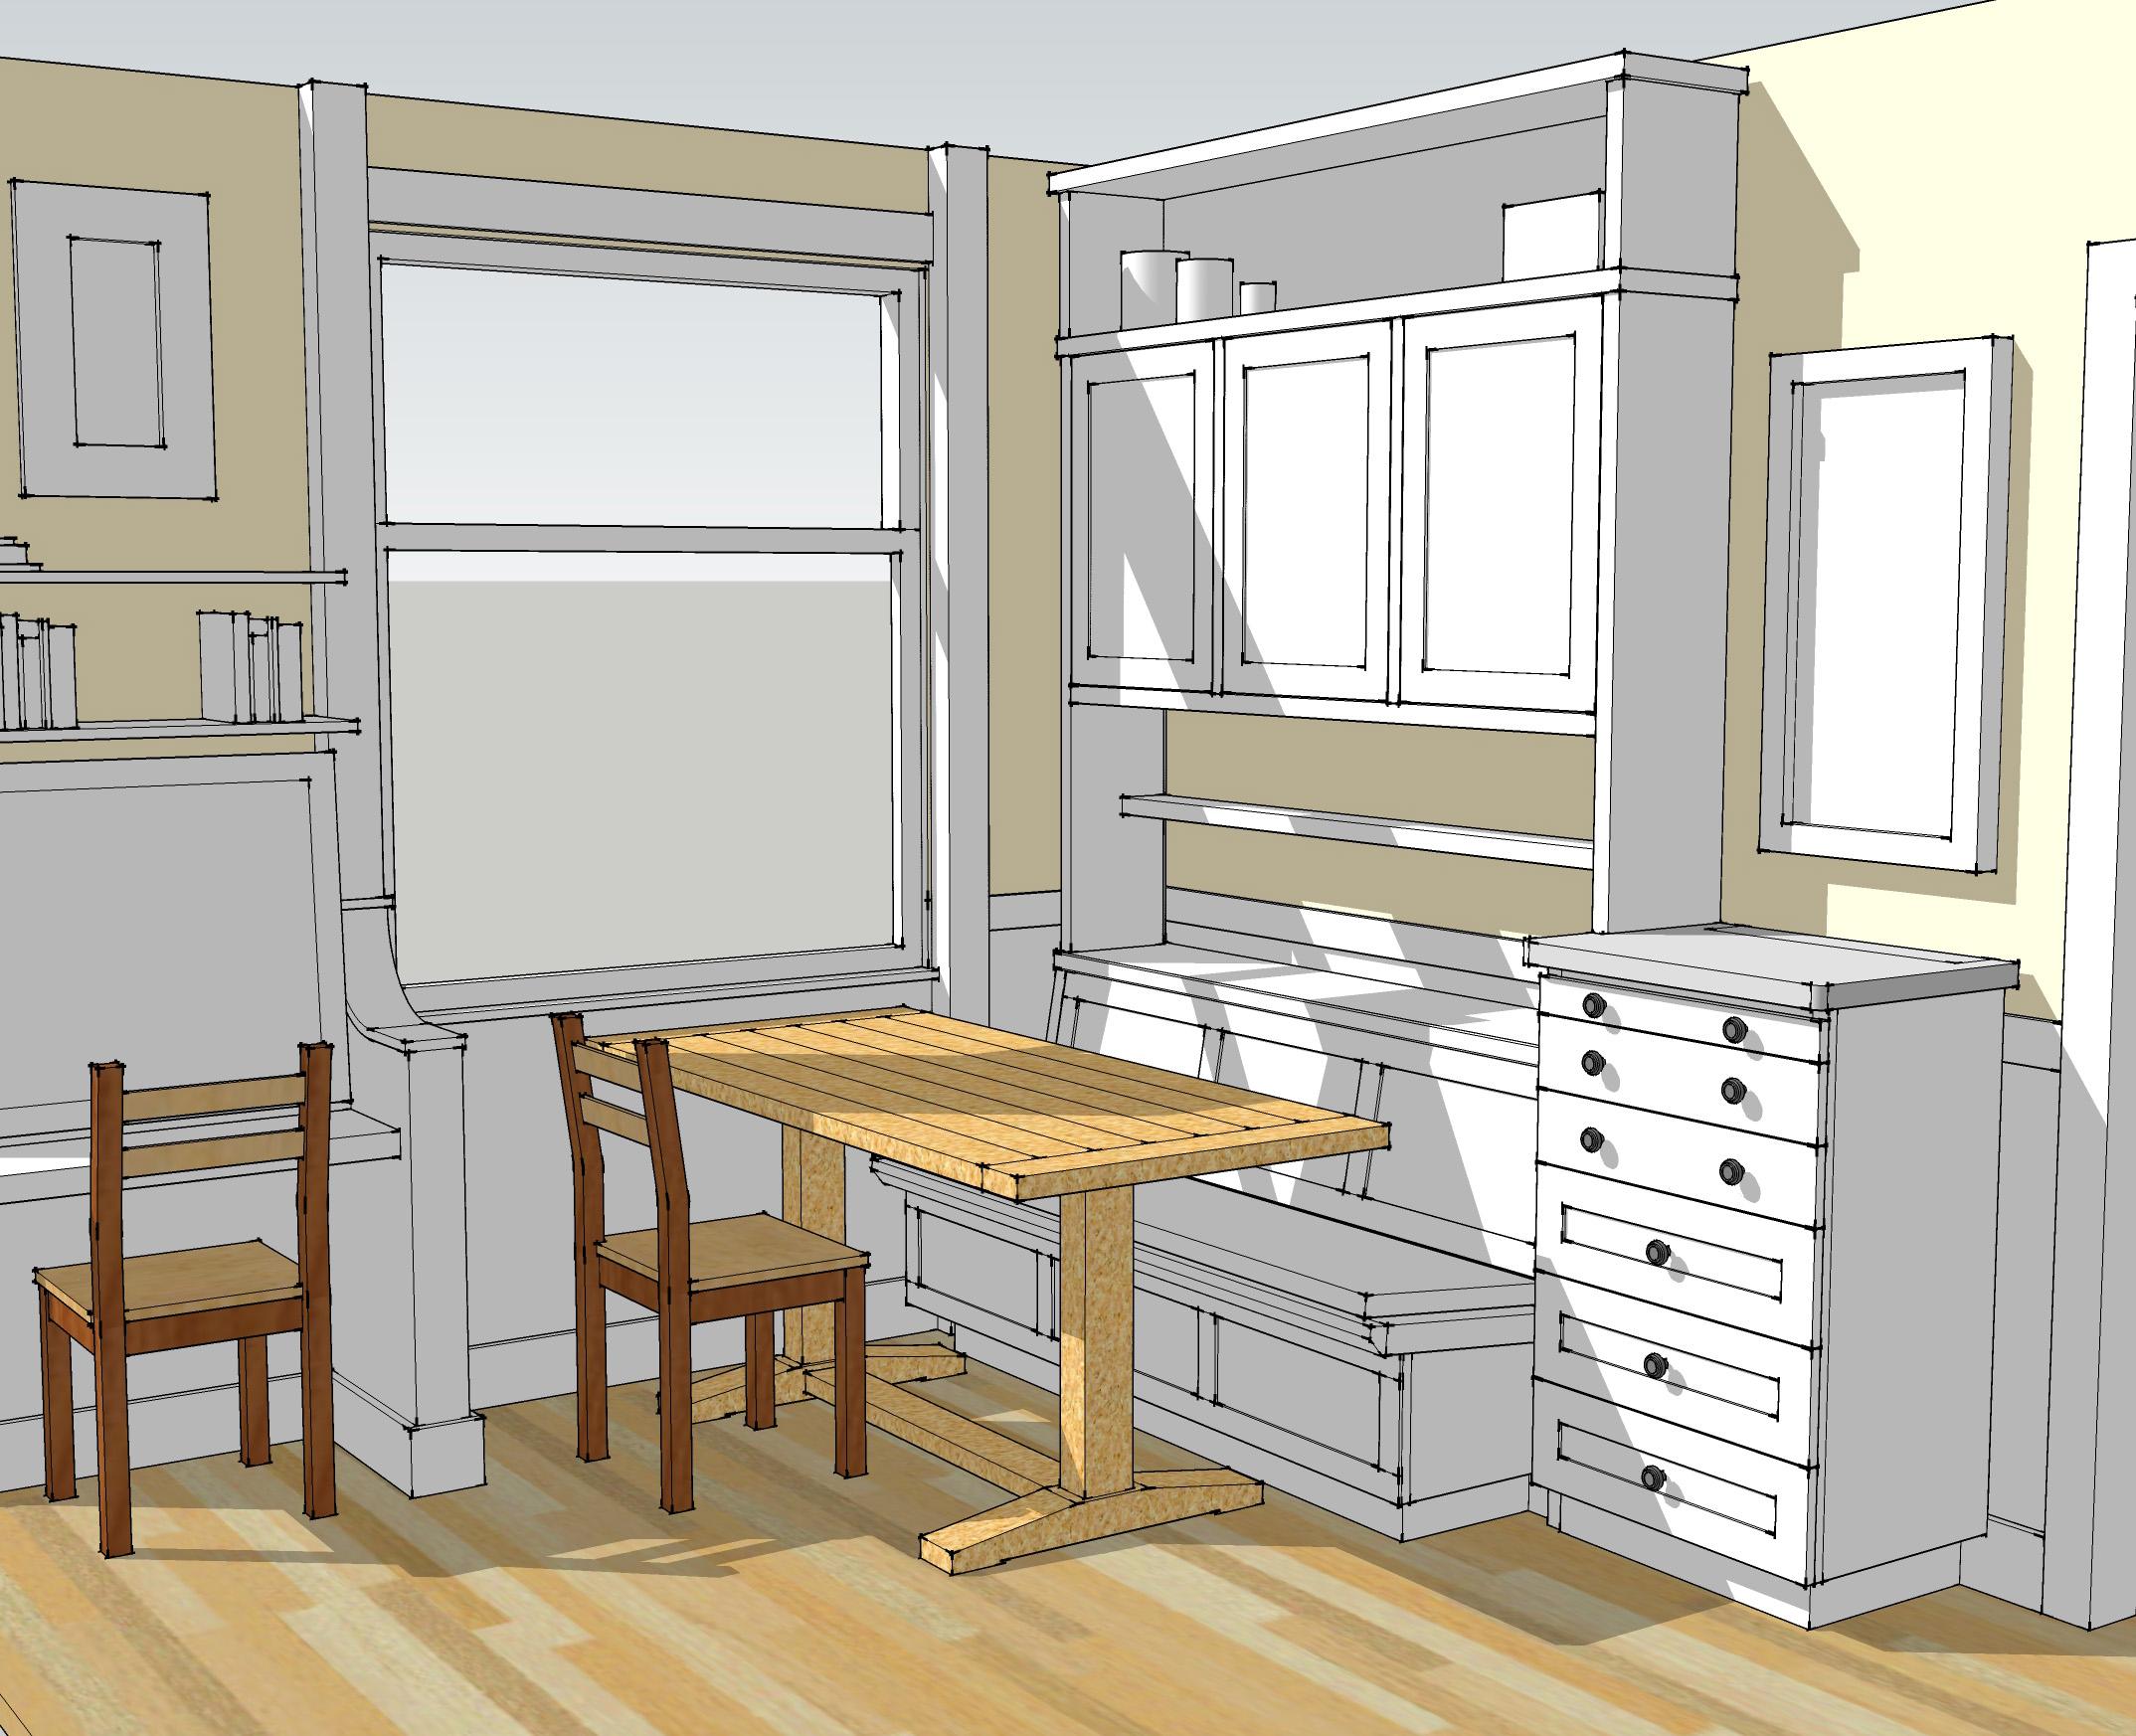 kitchen_built-in_final_rev.jpg